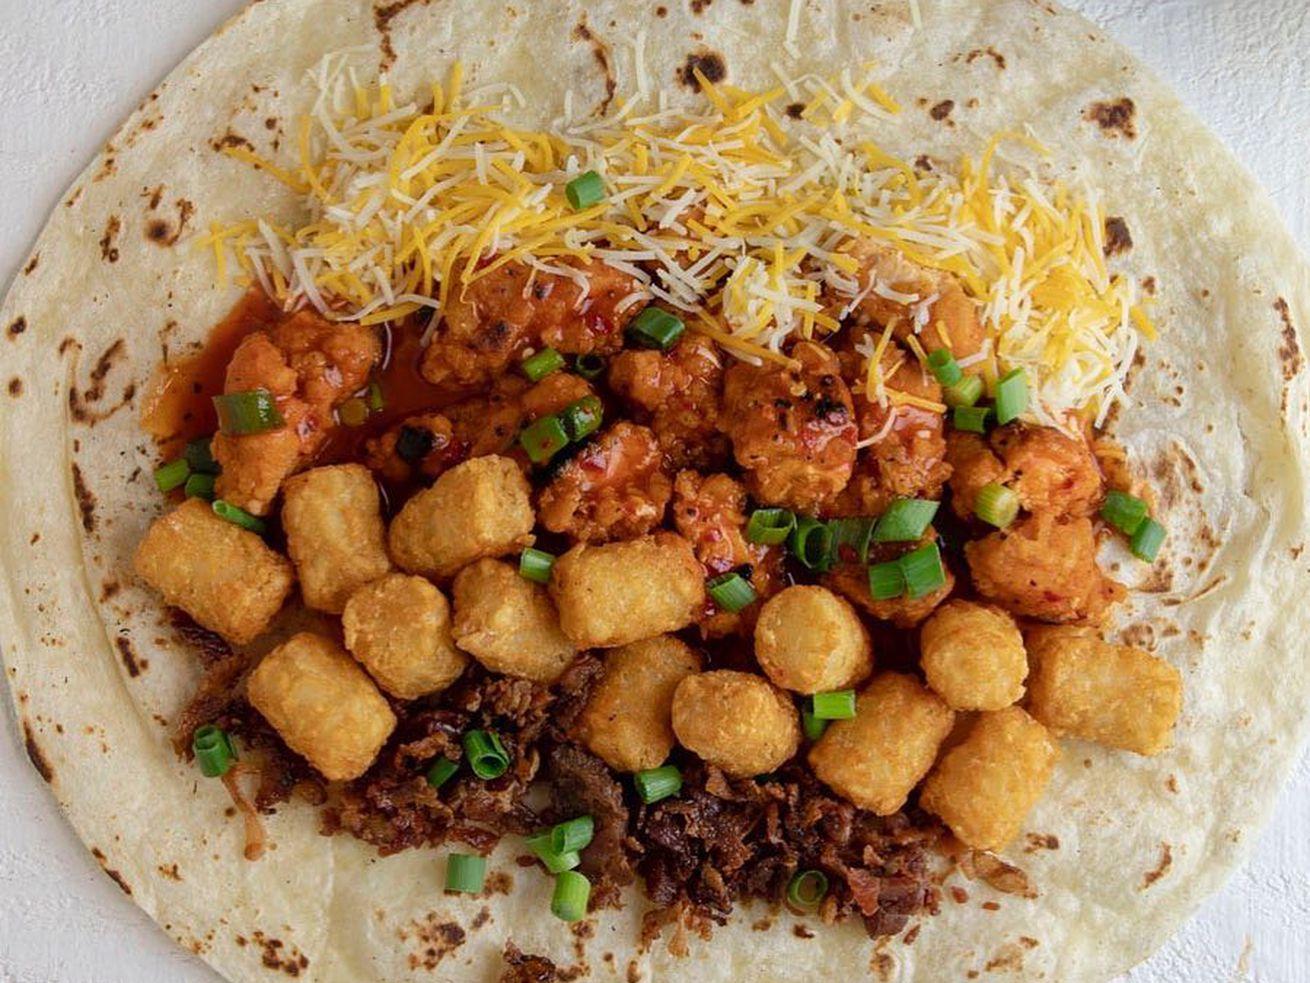 Nocturnal Eats' dracarys burrito